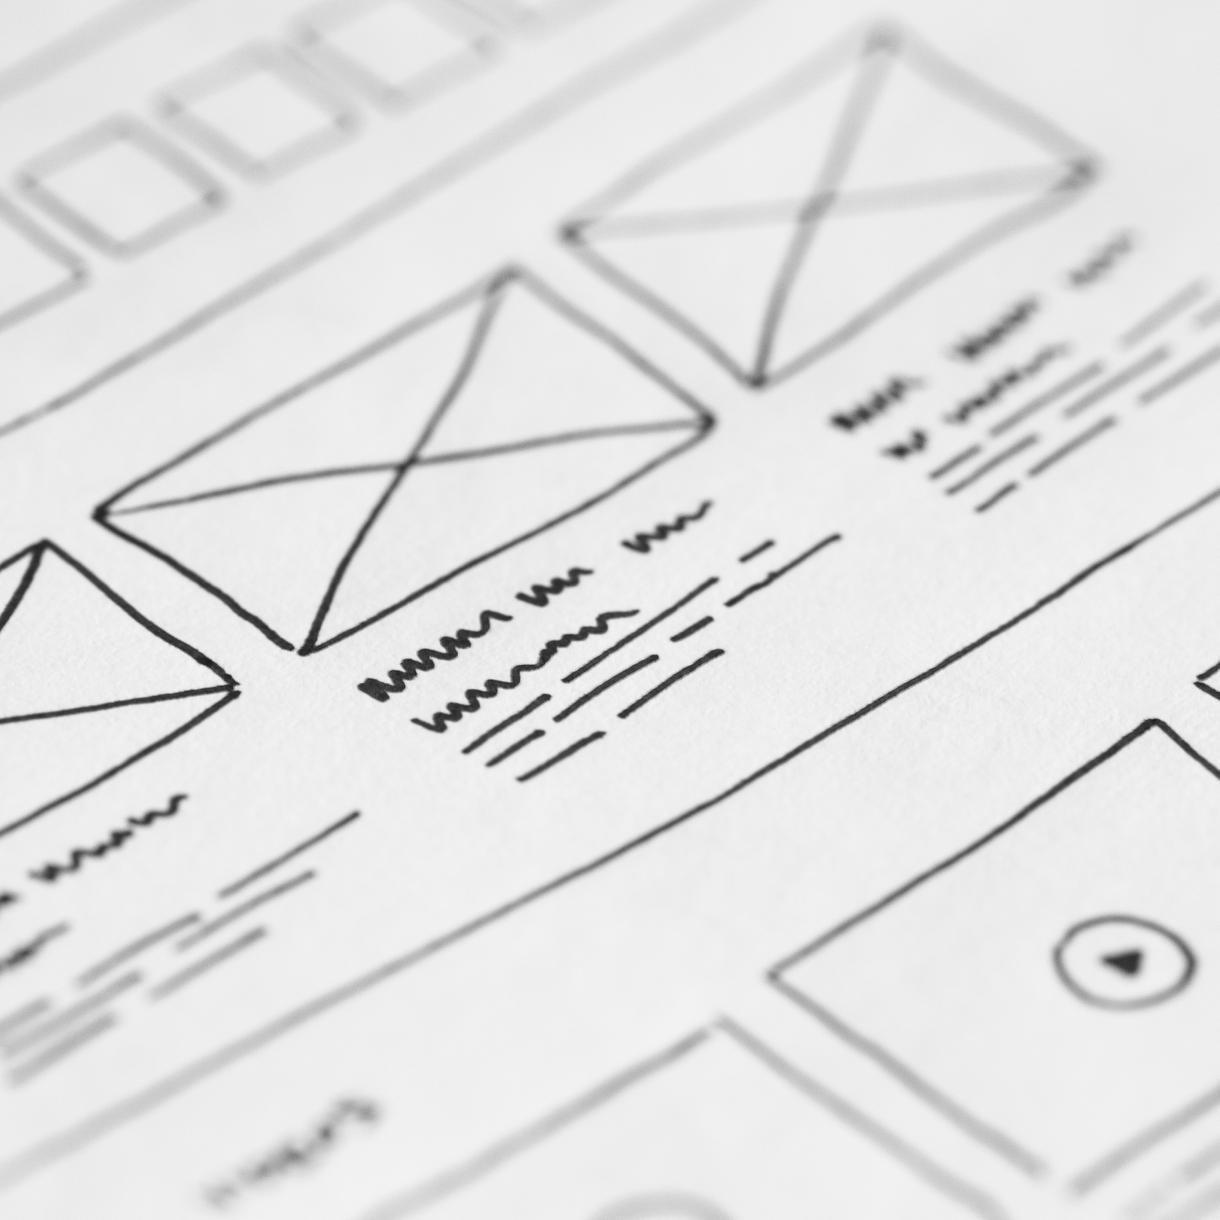 Webサイトのデザイン / コーディングします コンバージョンを得られるサイトを作ります!